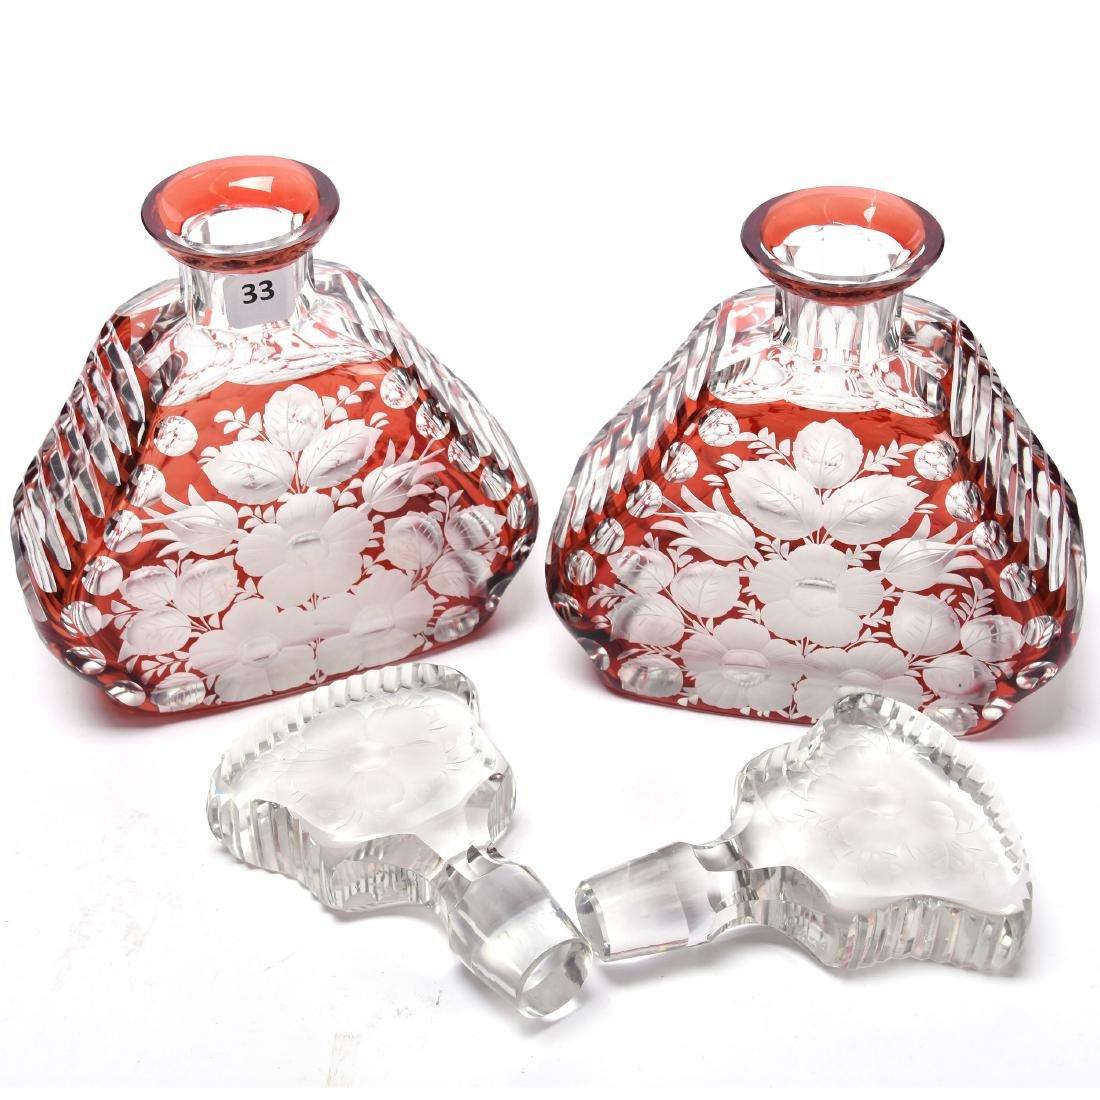 Pair Colognes, Engraved Floral Design - 2